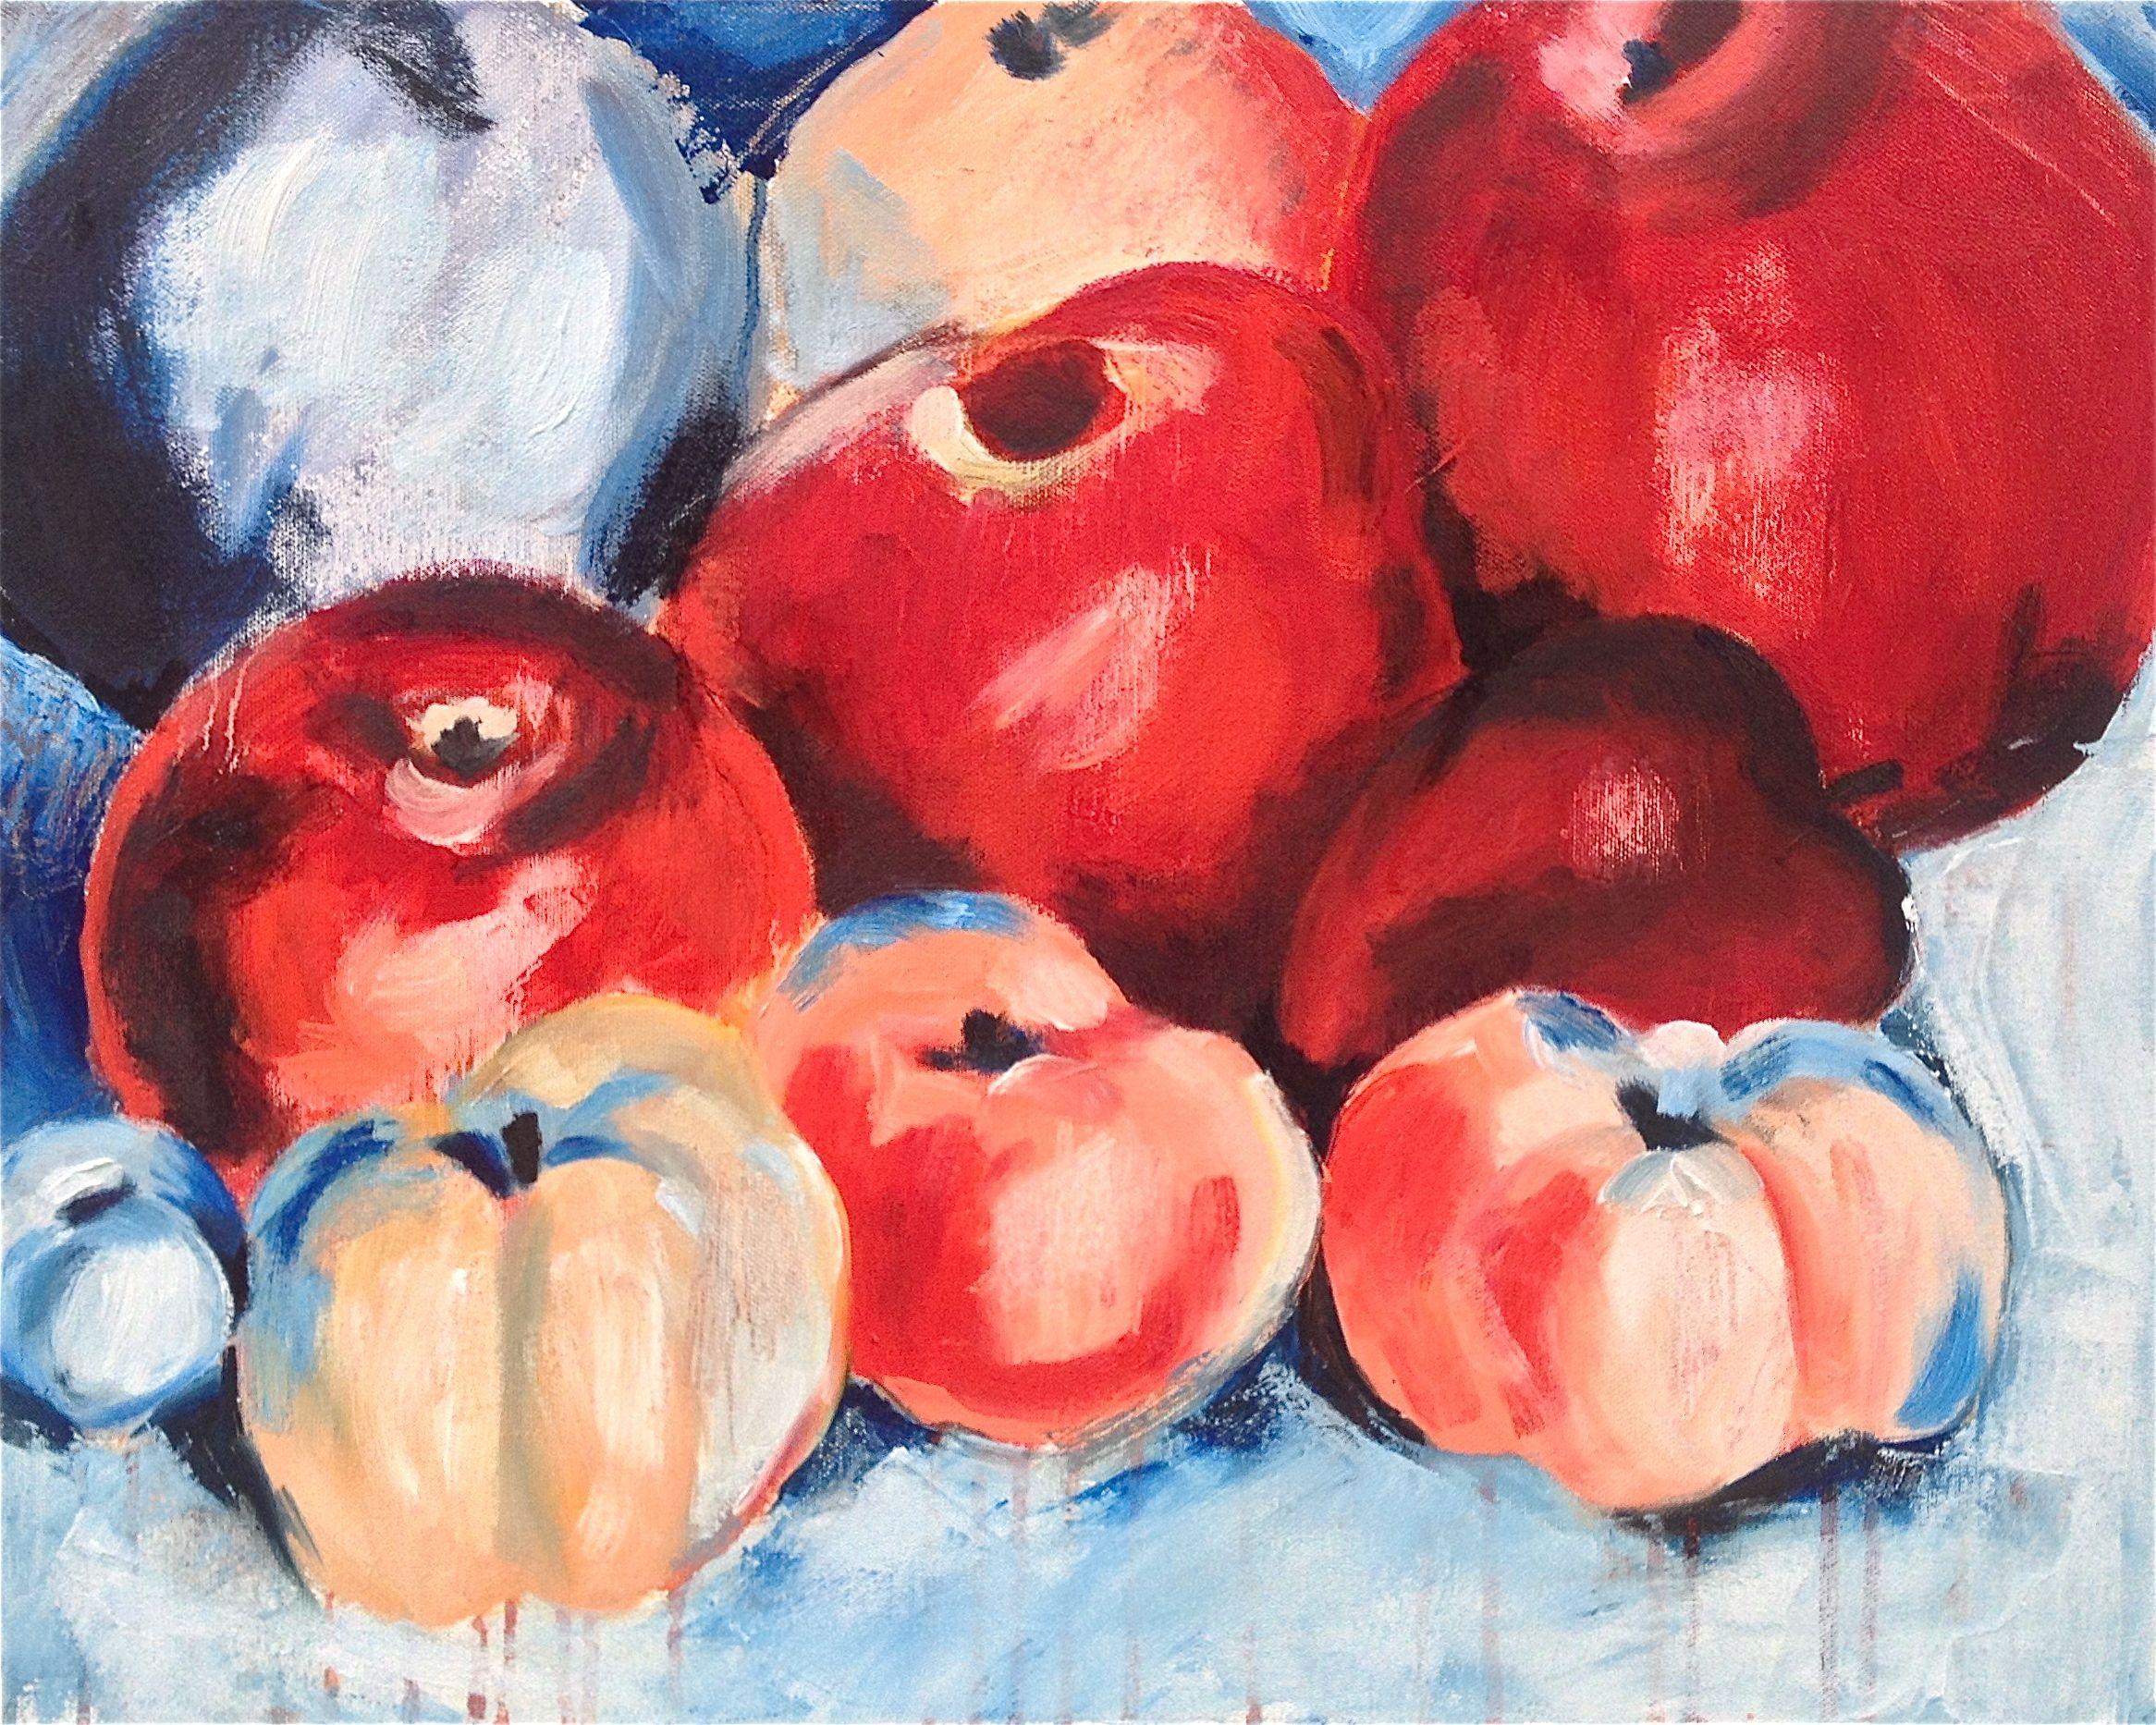 Georgia O'keefe's 'Family of Apples', NFS